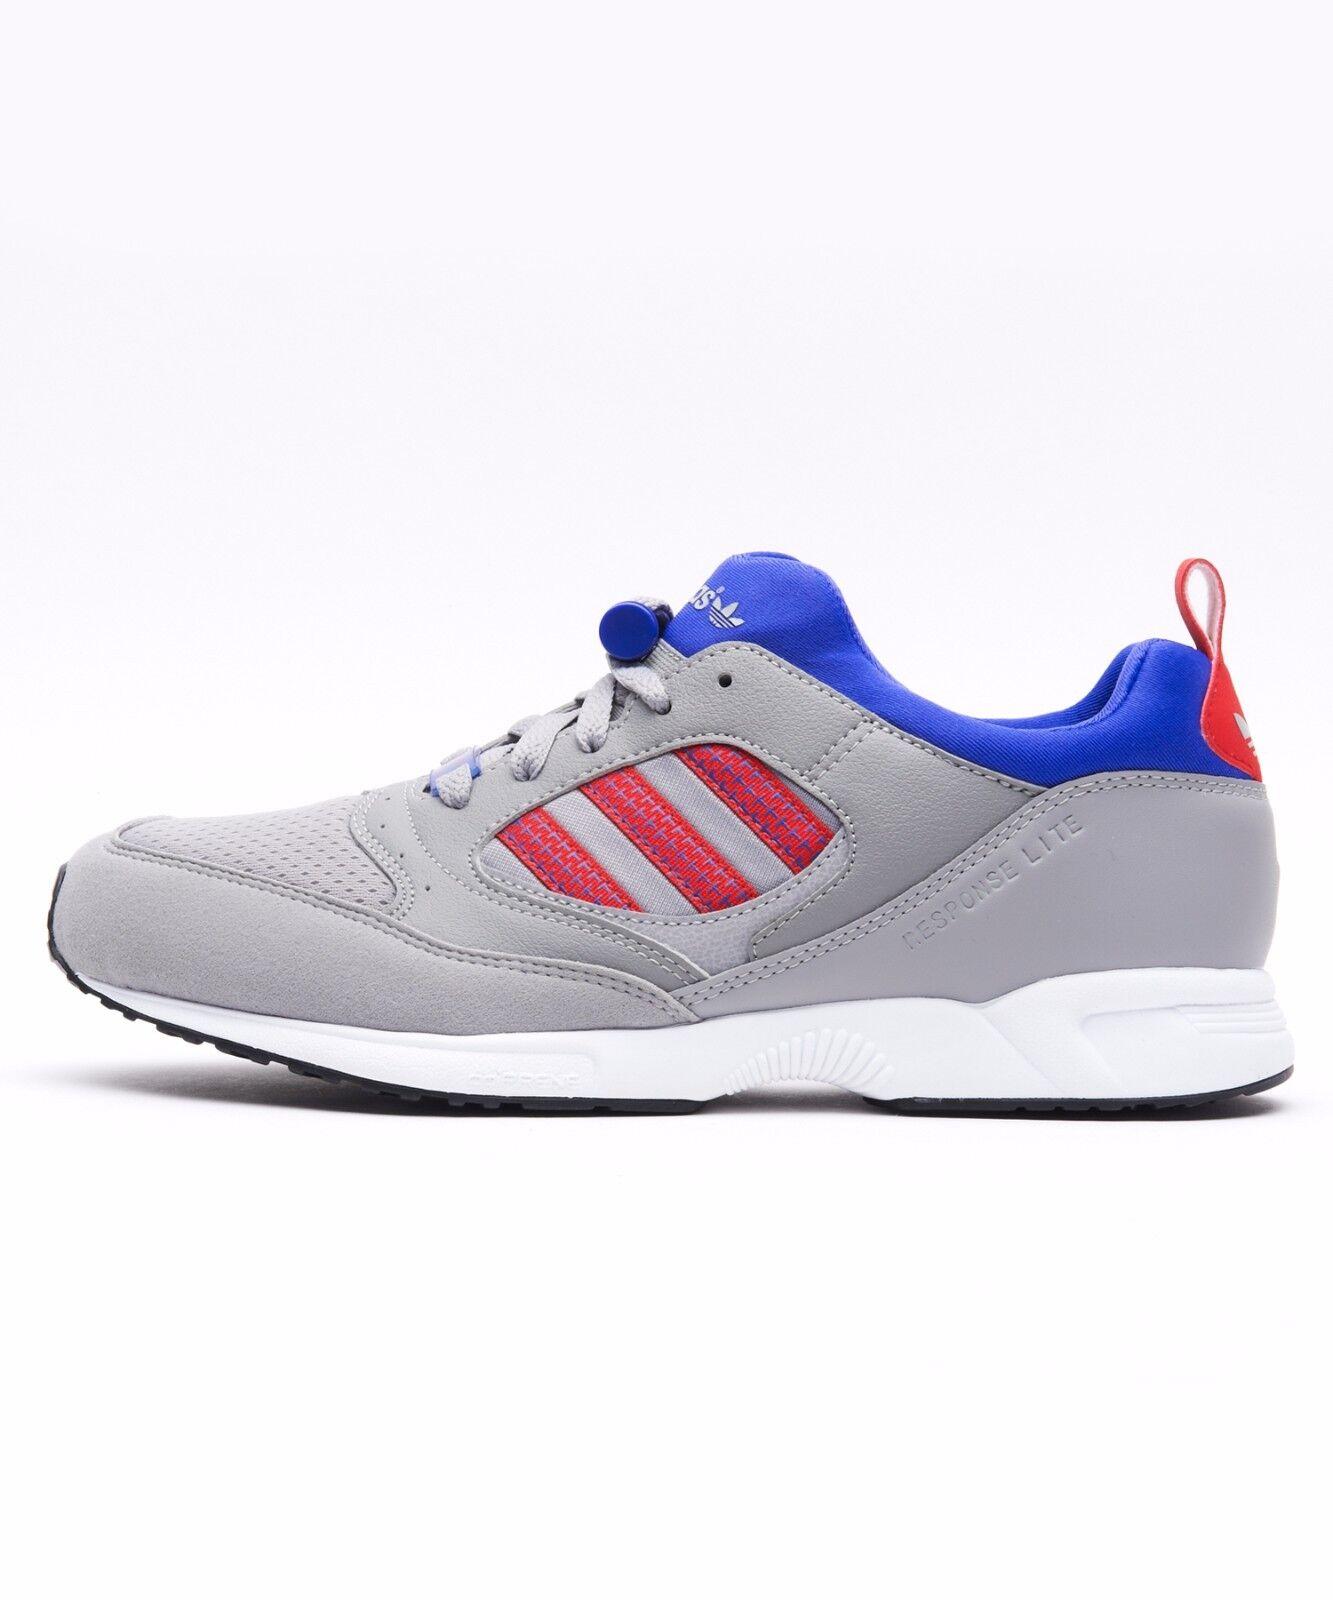 b7b1cf844 50%OFF New Adidas Originals Mens trainers Torsion Response Lite sport  shoes training